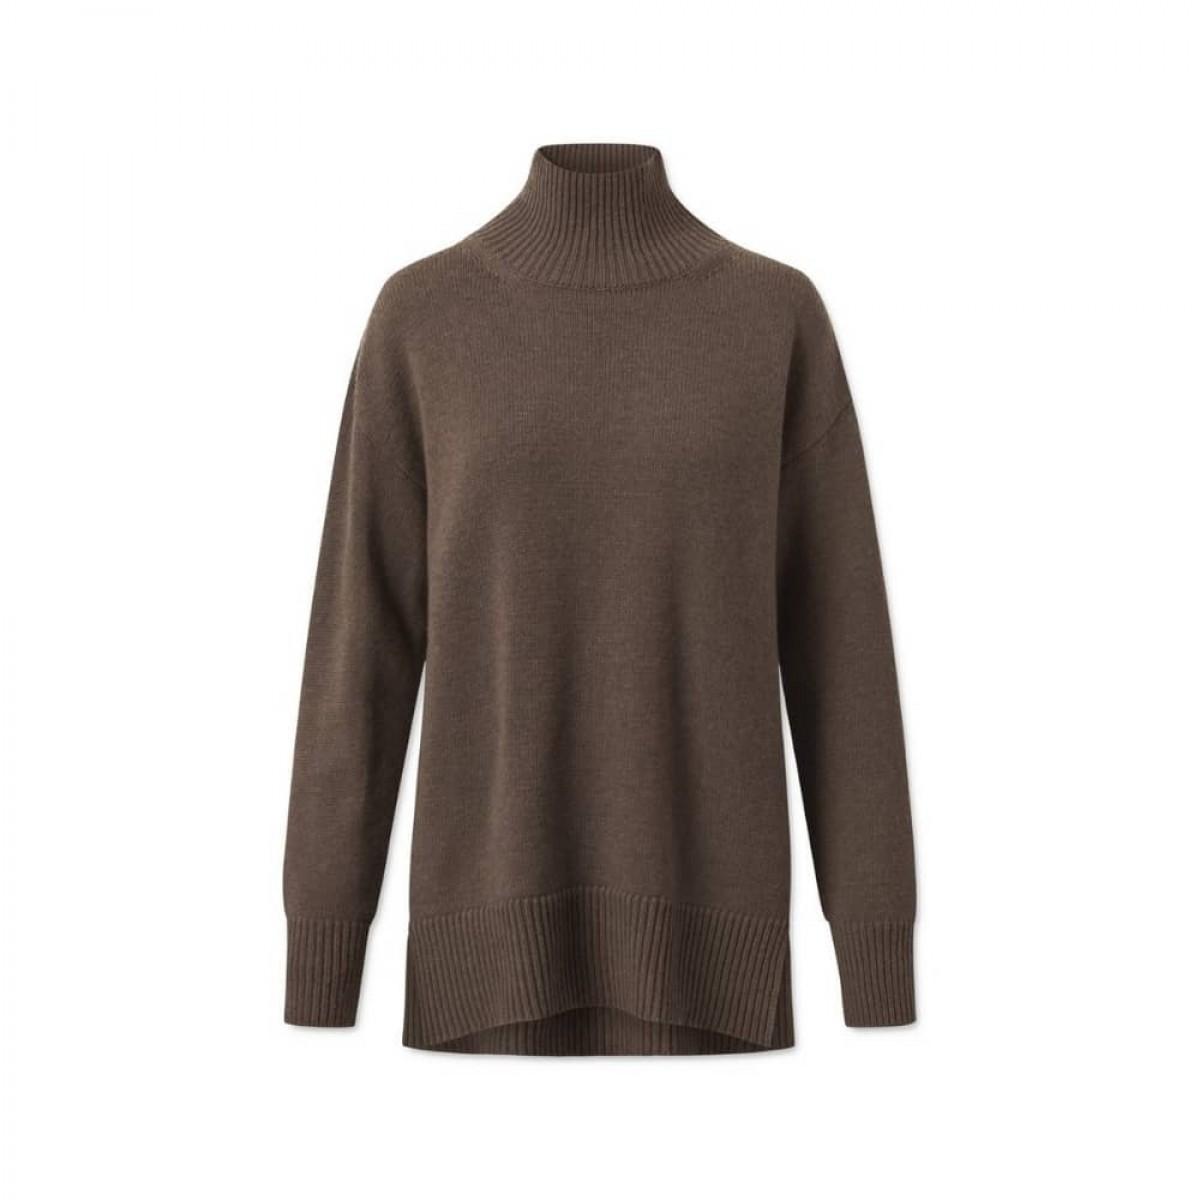 manny pullover - dark brown - front